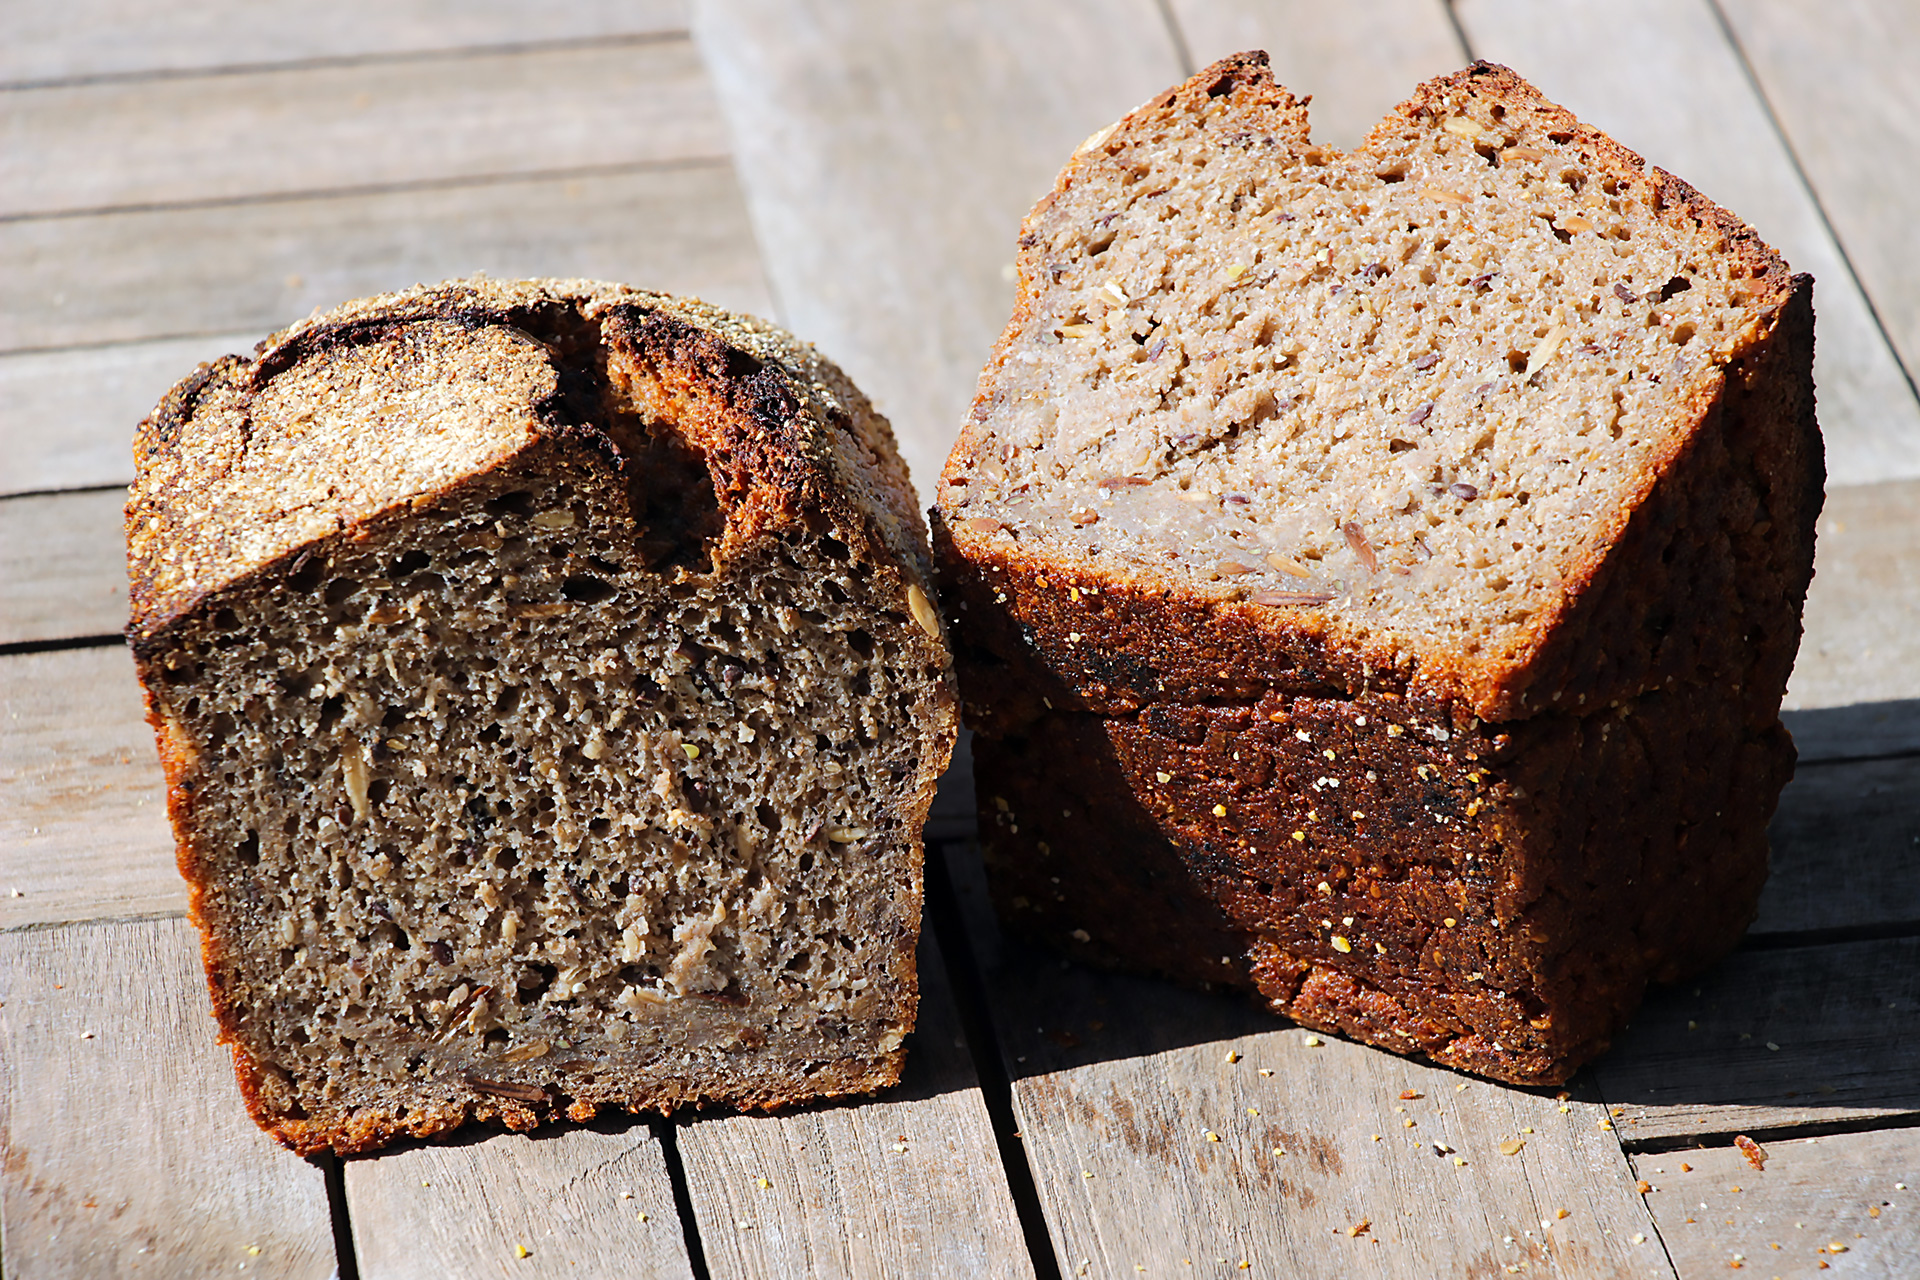 Josey Baker Dark Mountain Rye bread interior.